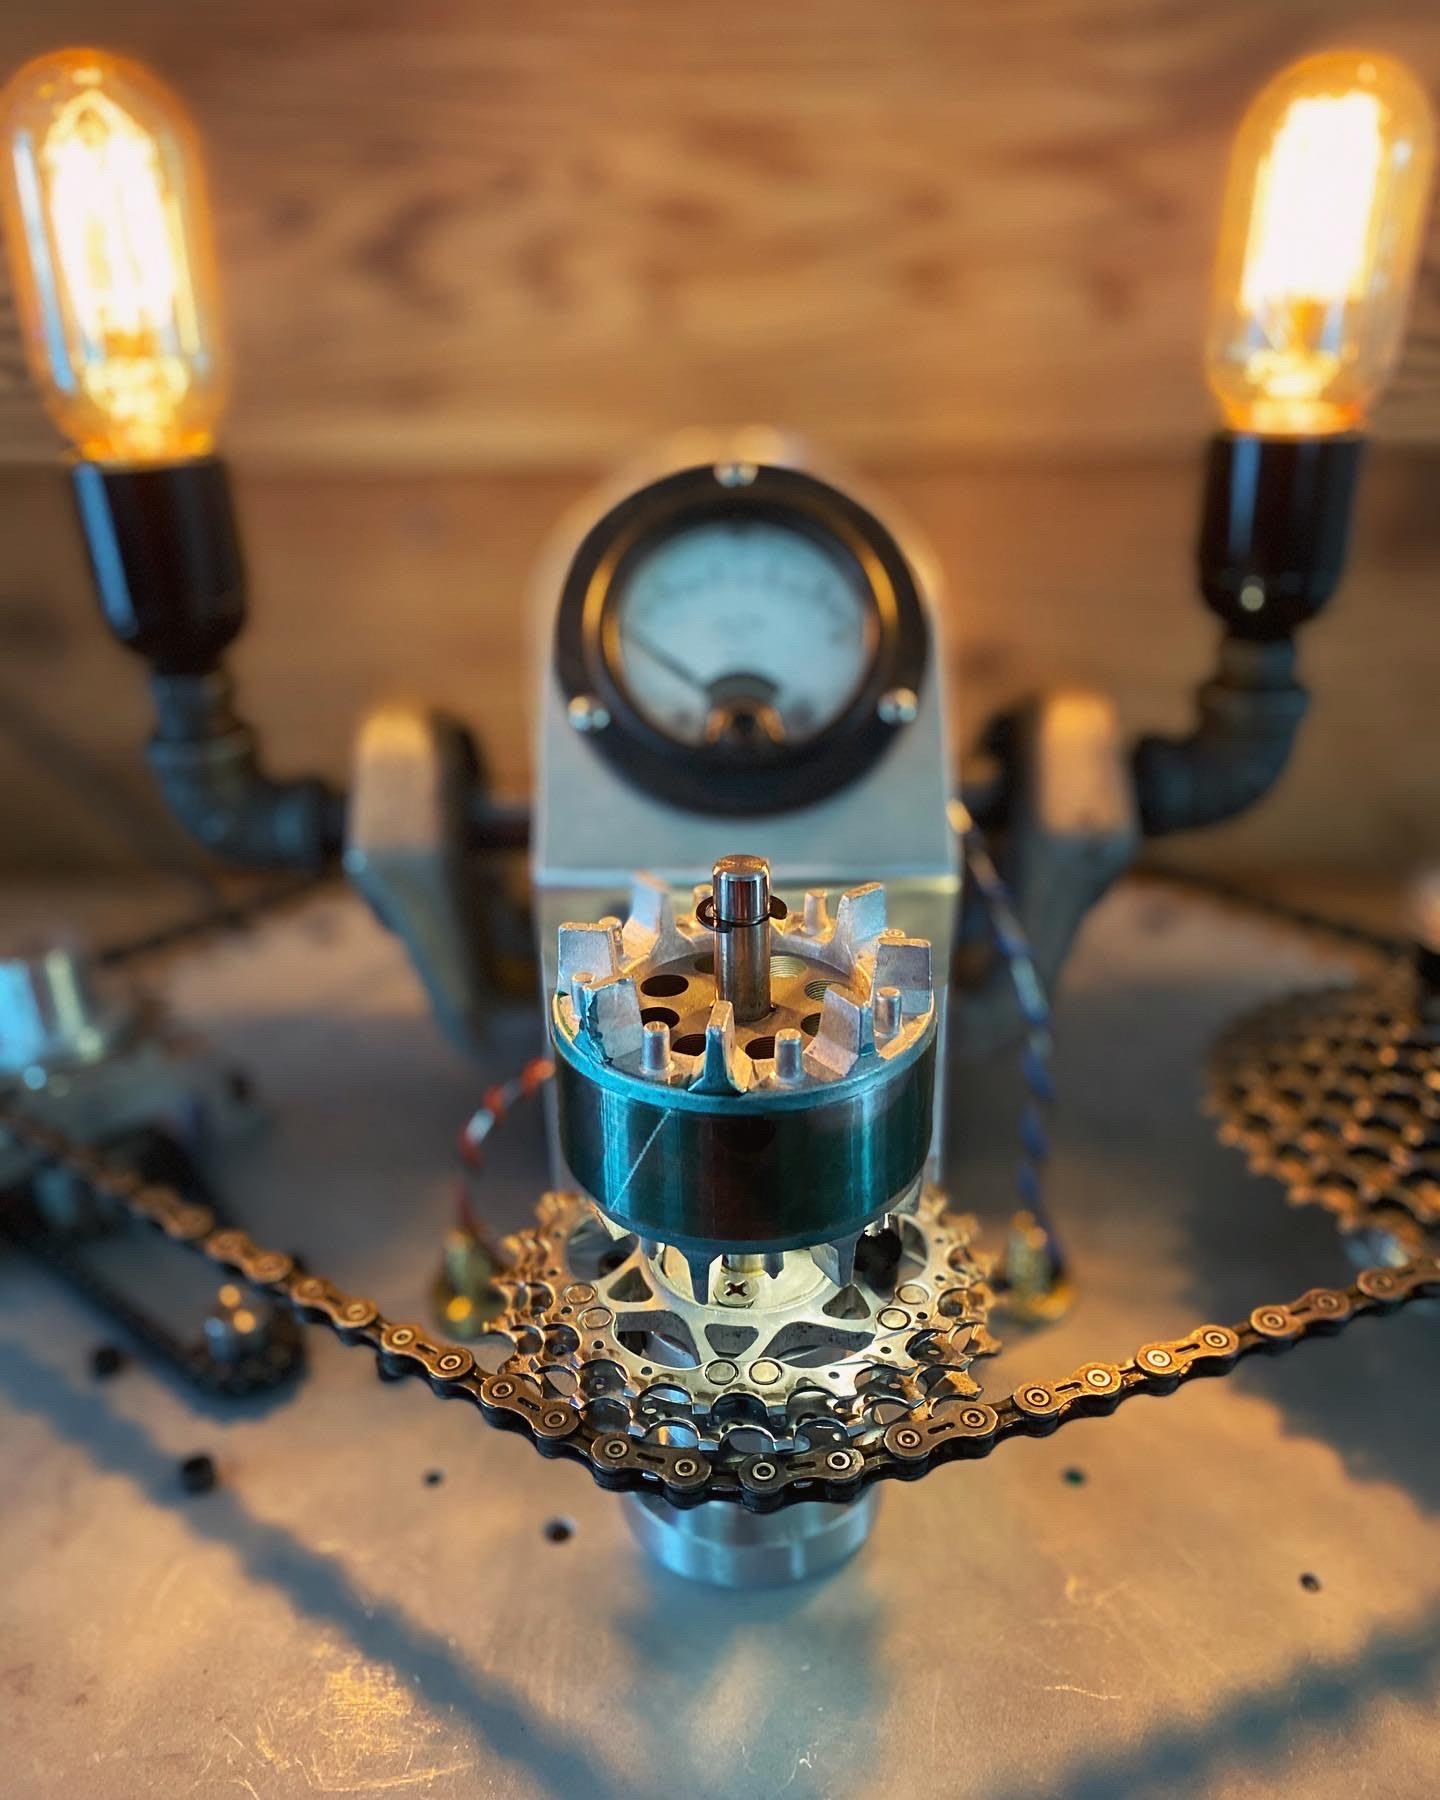 Close up of bespoke lamp construction, gears, lamp, customized, Ed Musho, adidas, employee